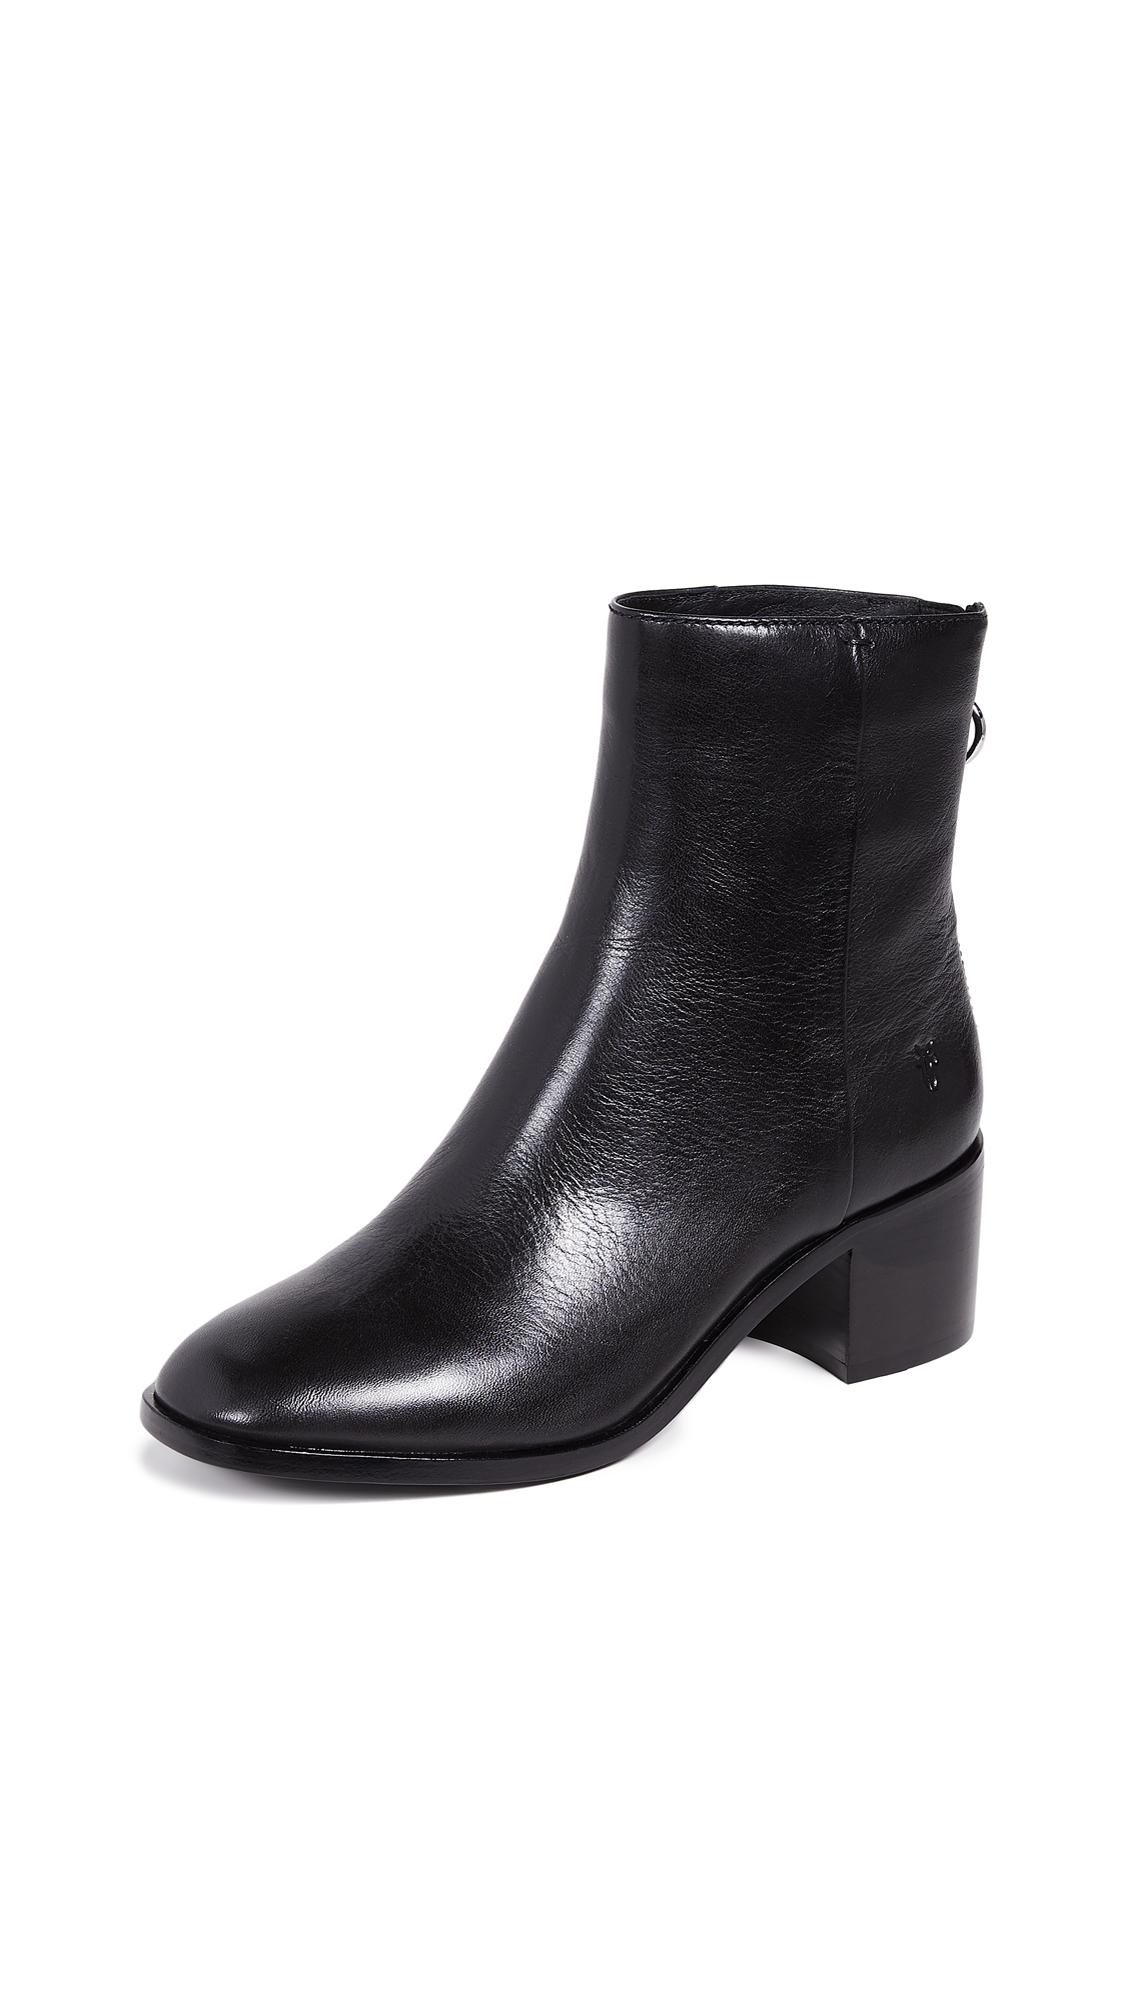 Frye Emilia Short Boots - Black